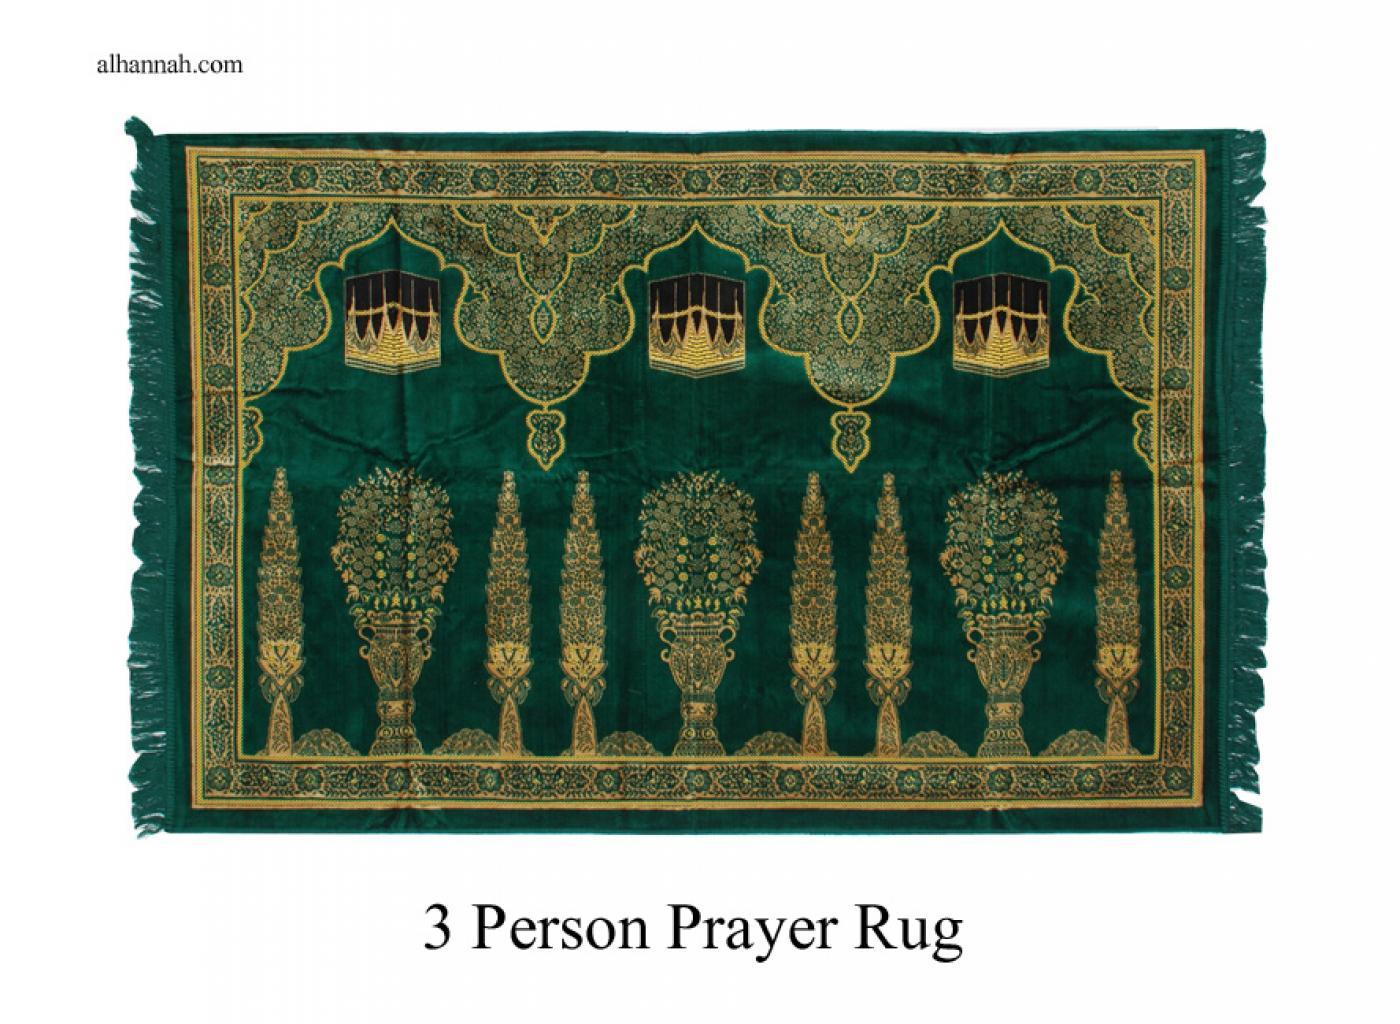 Three Person Acrylic Prayer Rug ii1010